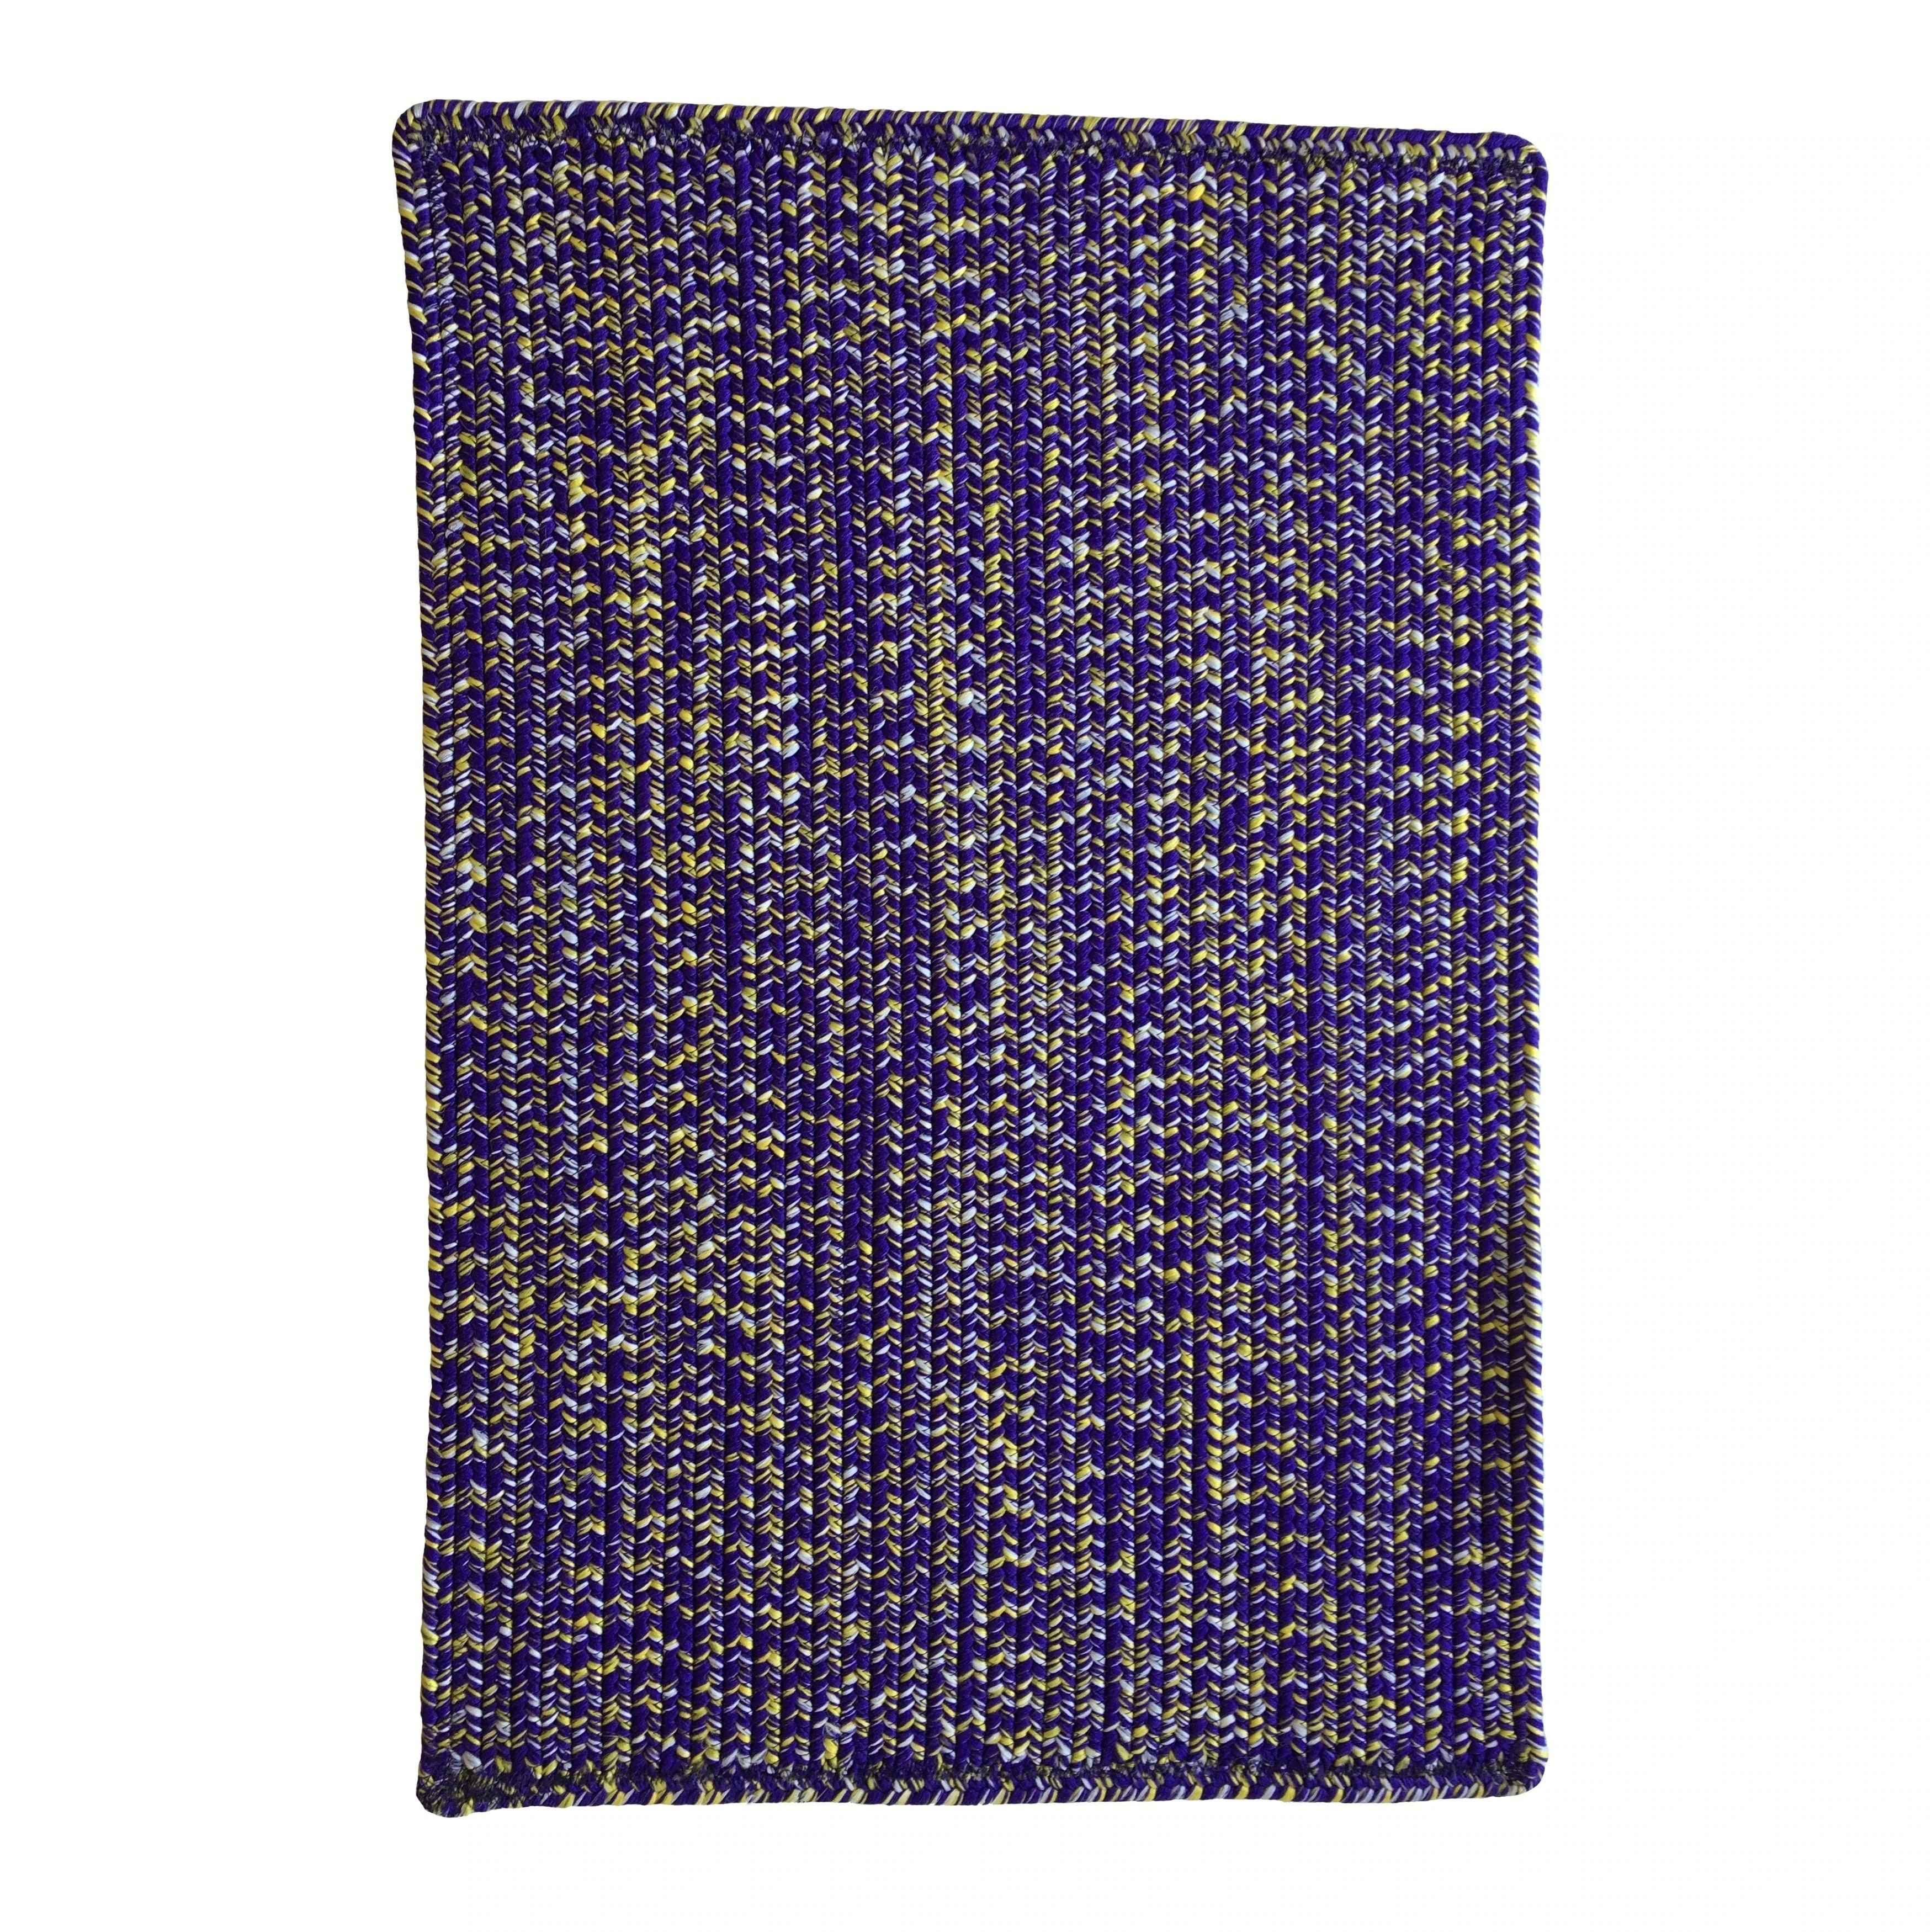 Capel Rugs Team Spirit Purple Gold Hand-Braided Vertical Stripe Rectangle Area Rug - 3' x 5'